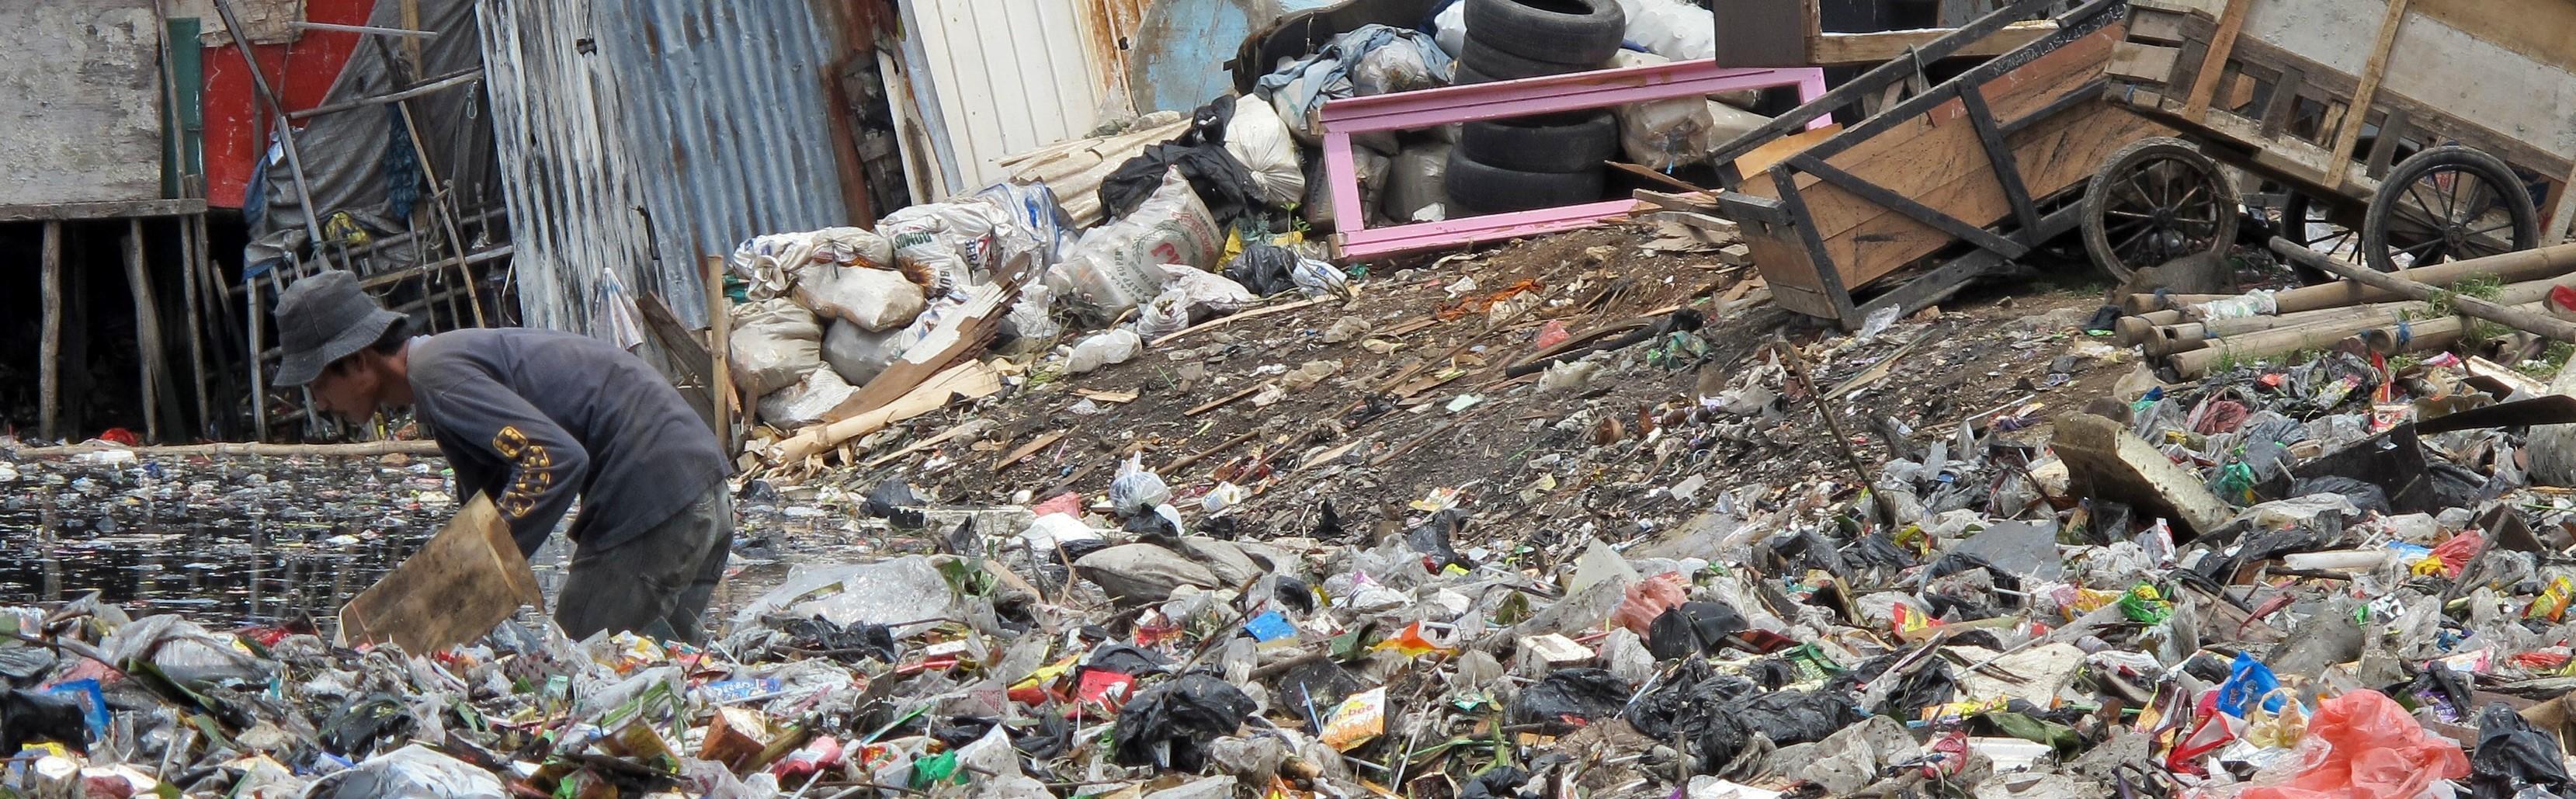 Tackling Increasing Plastic Waste